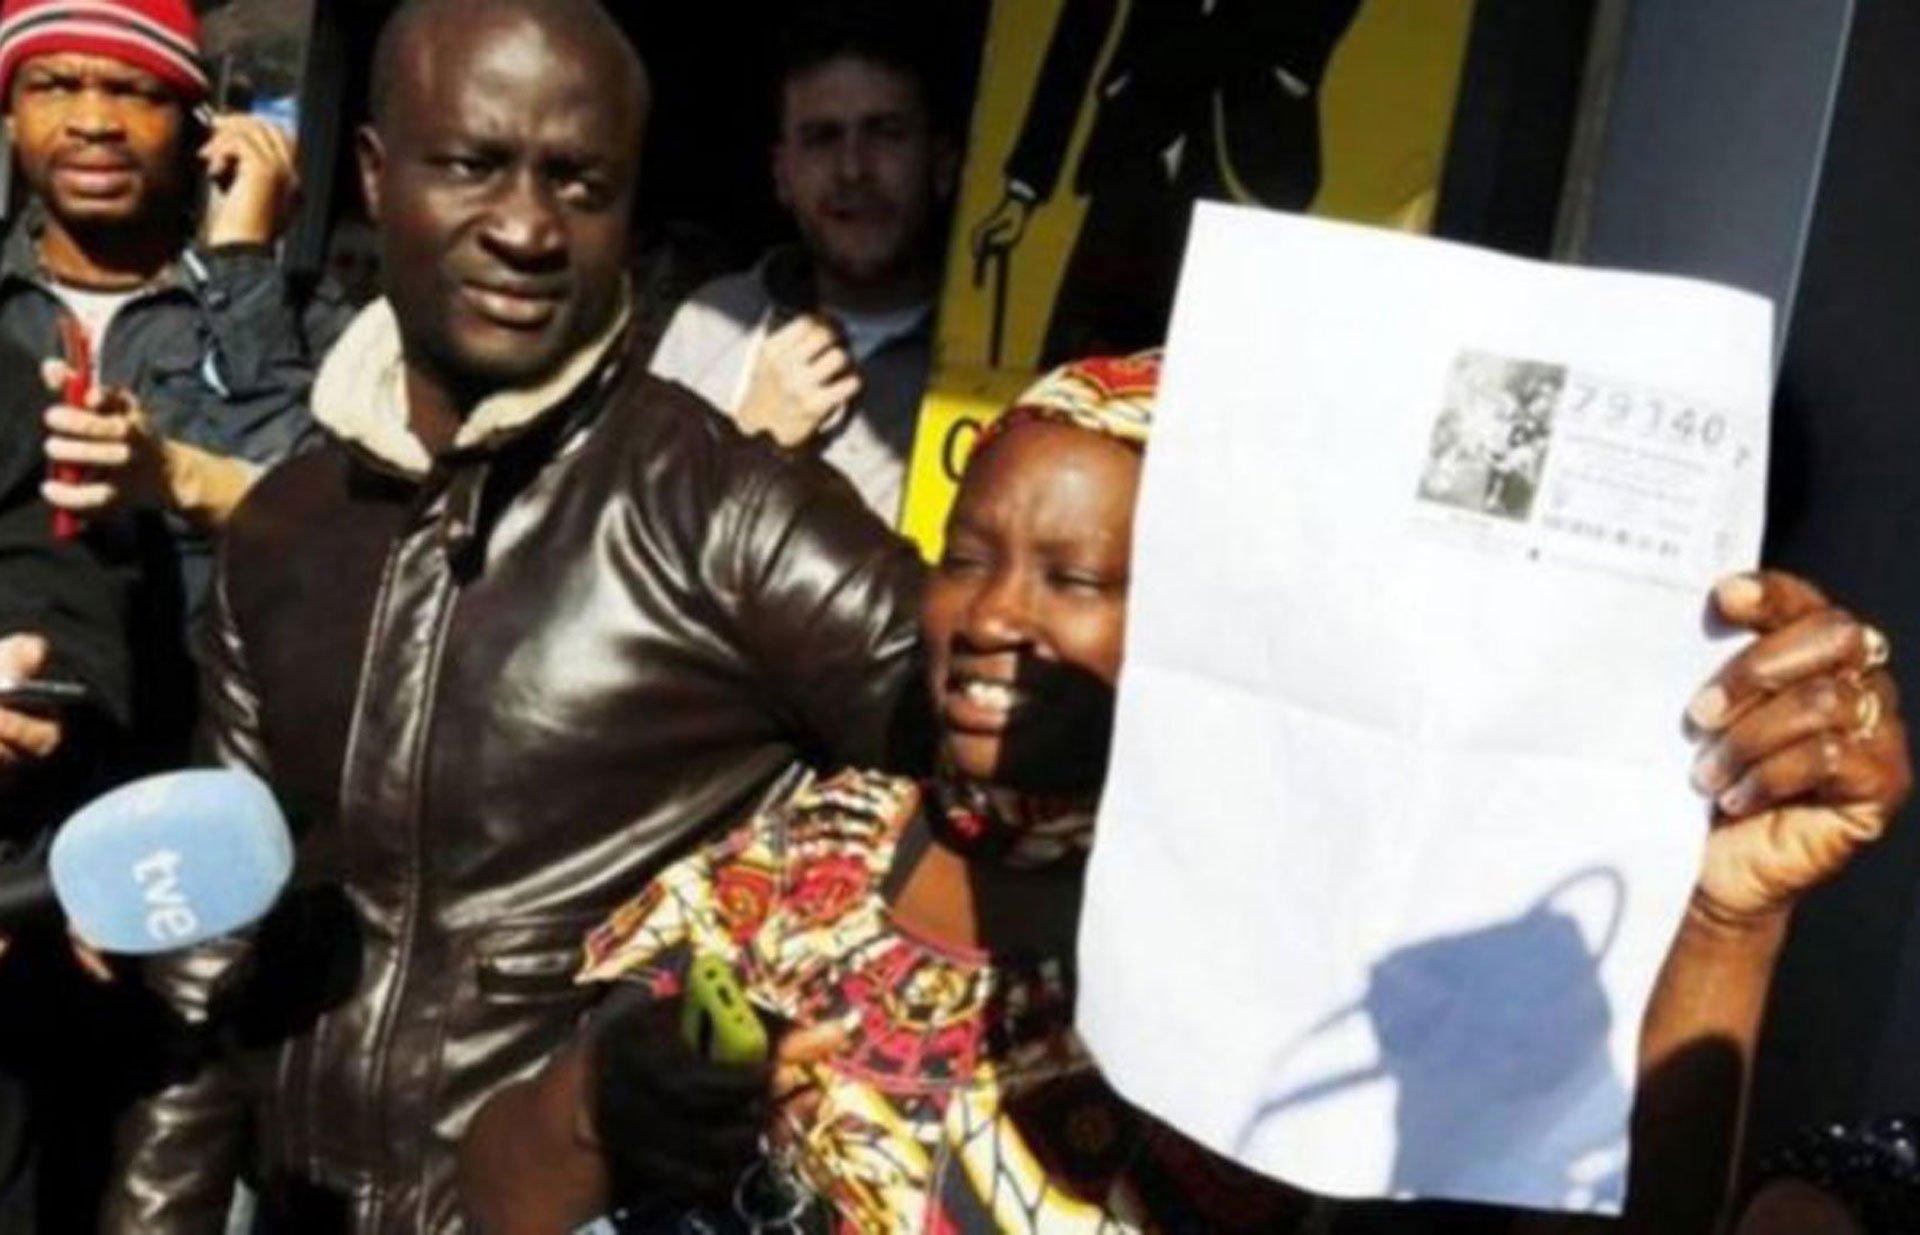 Izbjeglica iz Senegala dobio 400.000 eura na lotu